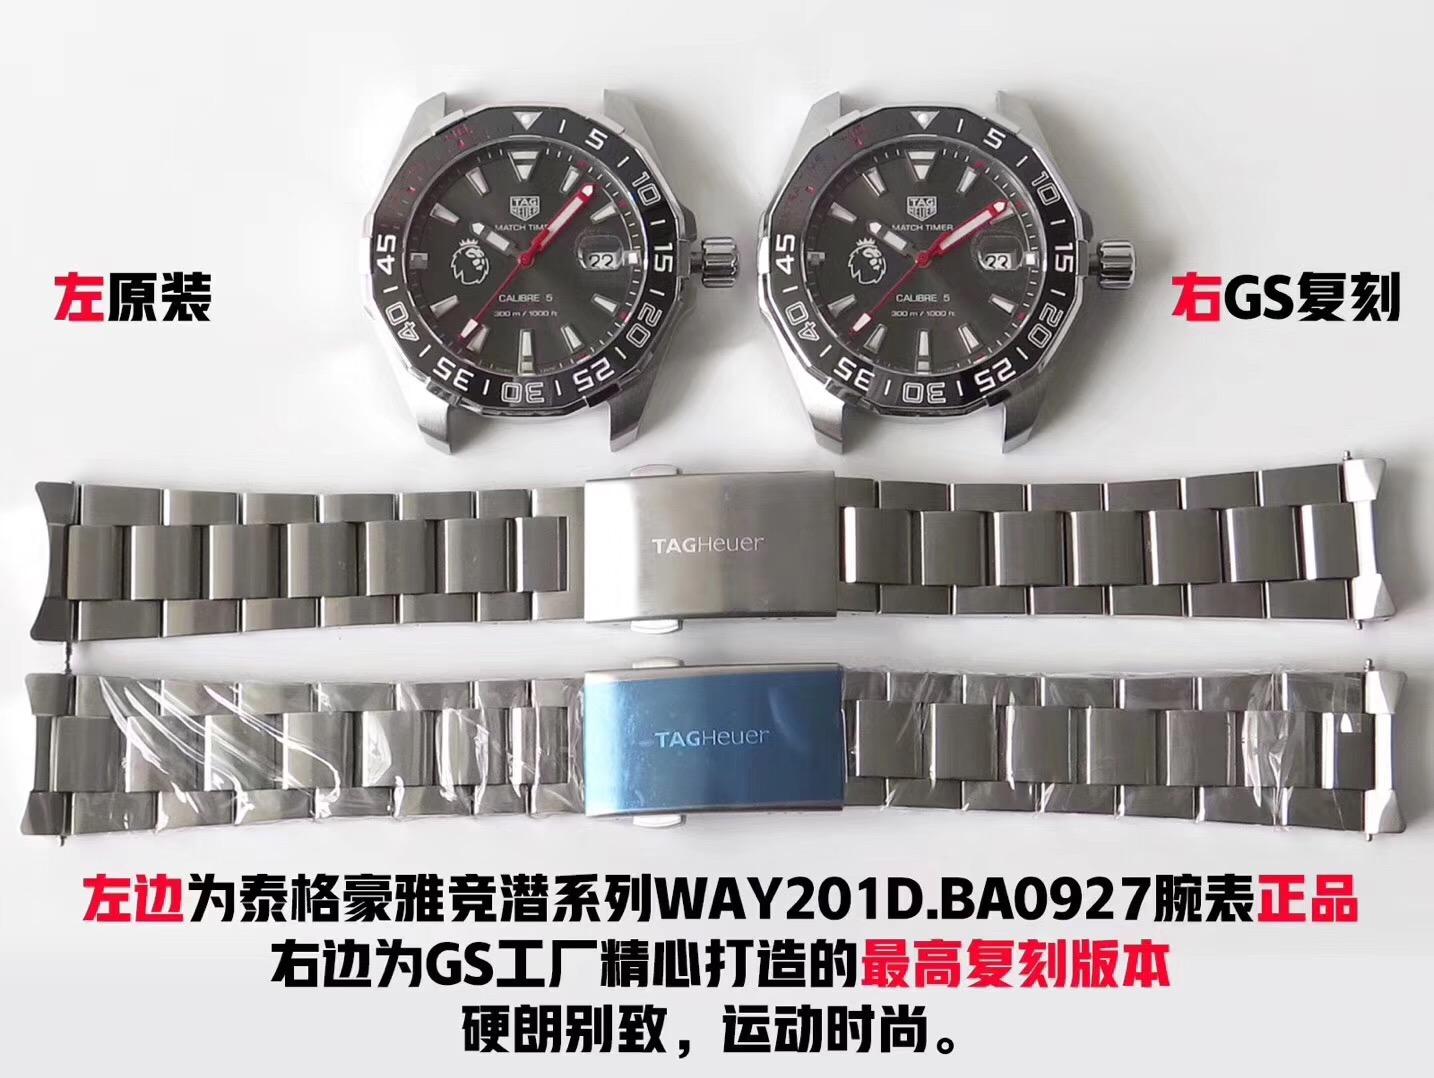 <b>GS厂泰格豪雅竞潜英超/中超联赛特别版对比正品</b>